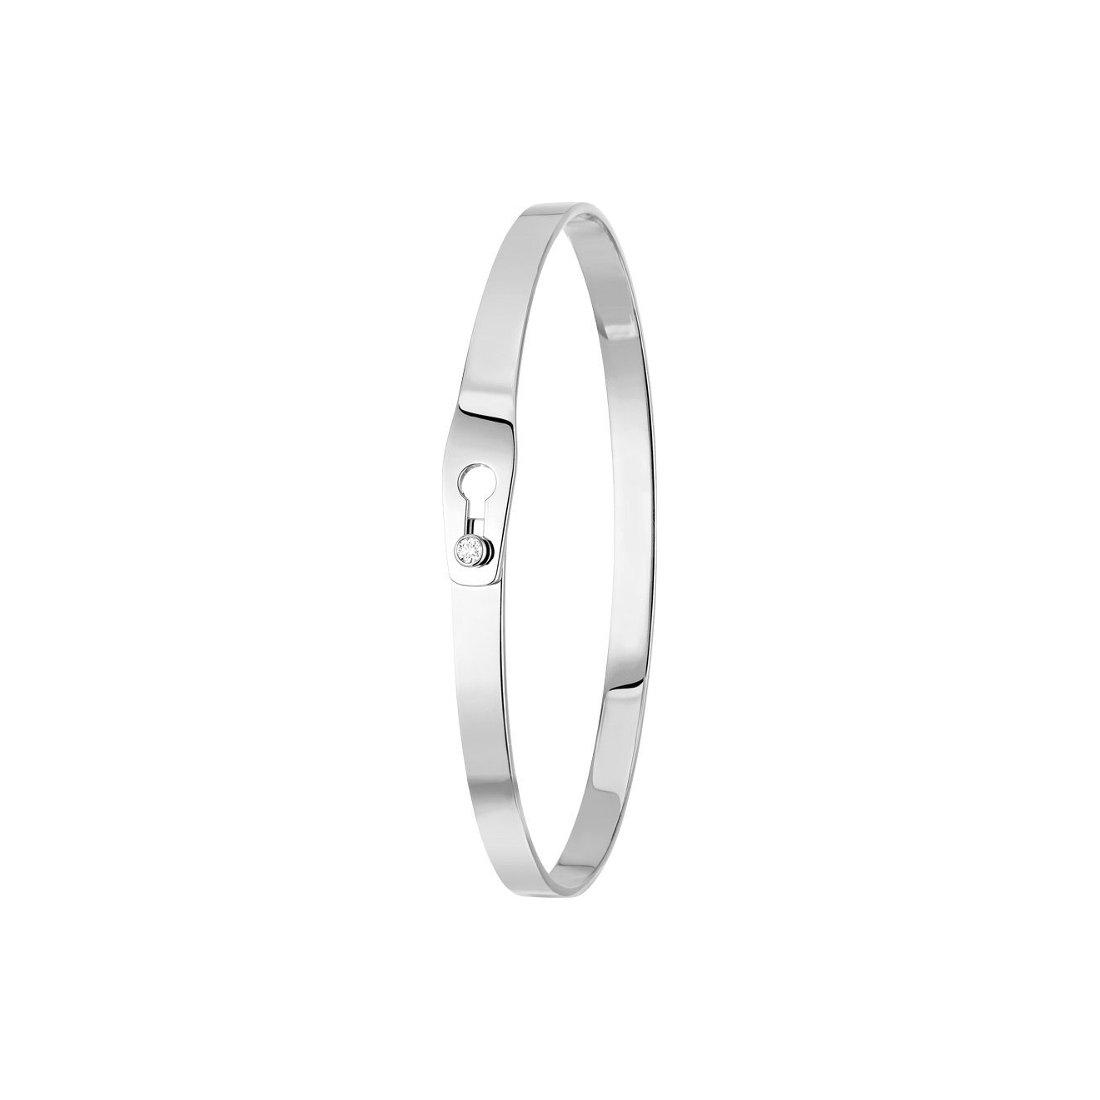 Bracelet dinh van Serrure en or blanc et diamants vue 1